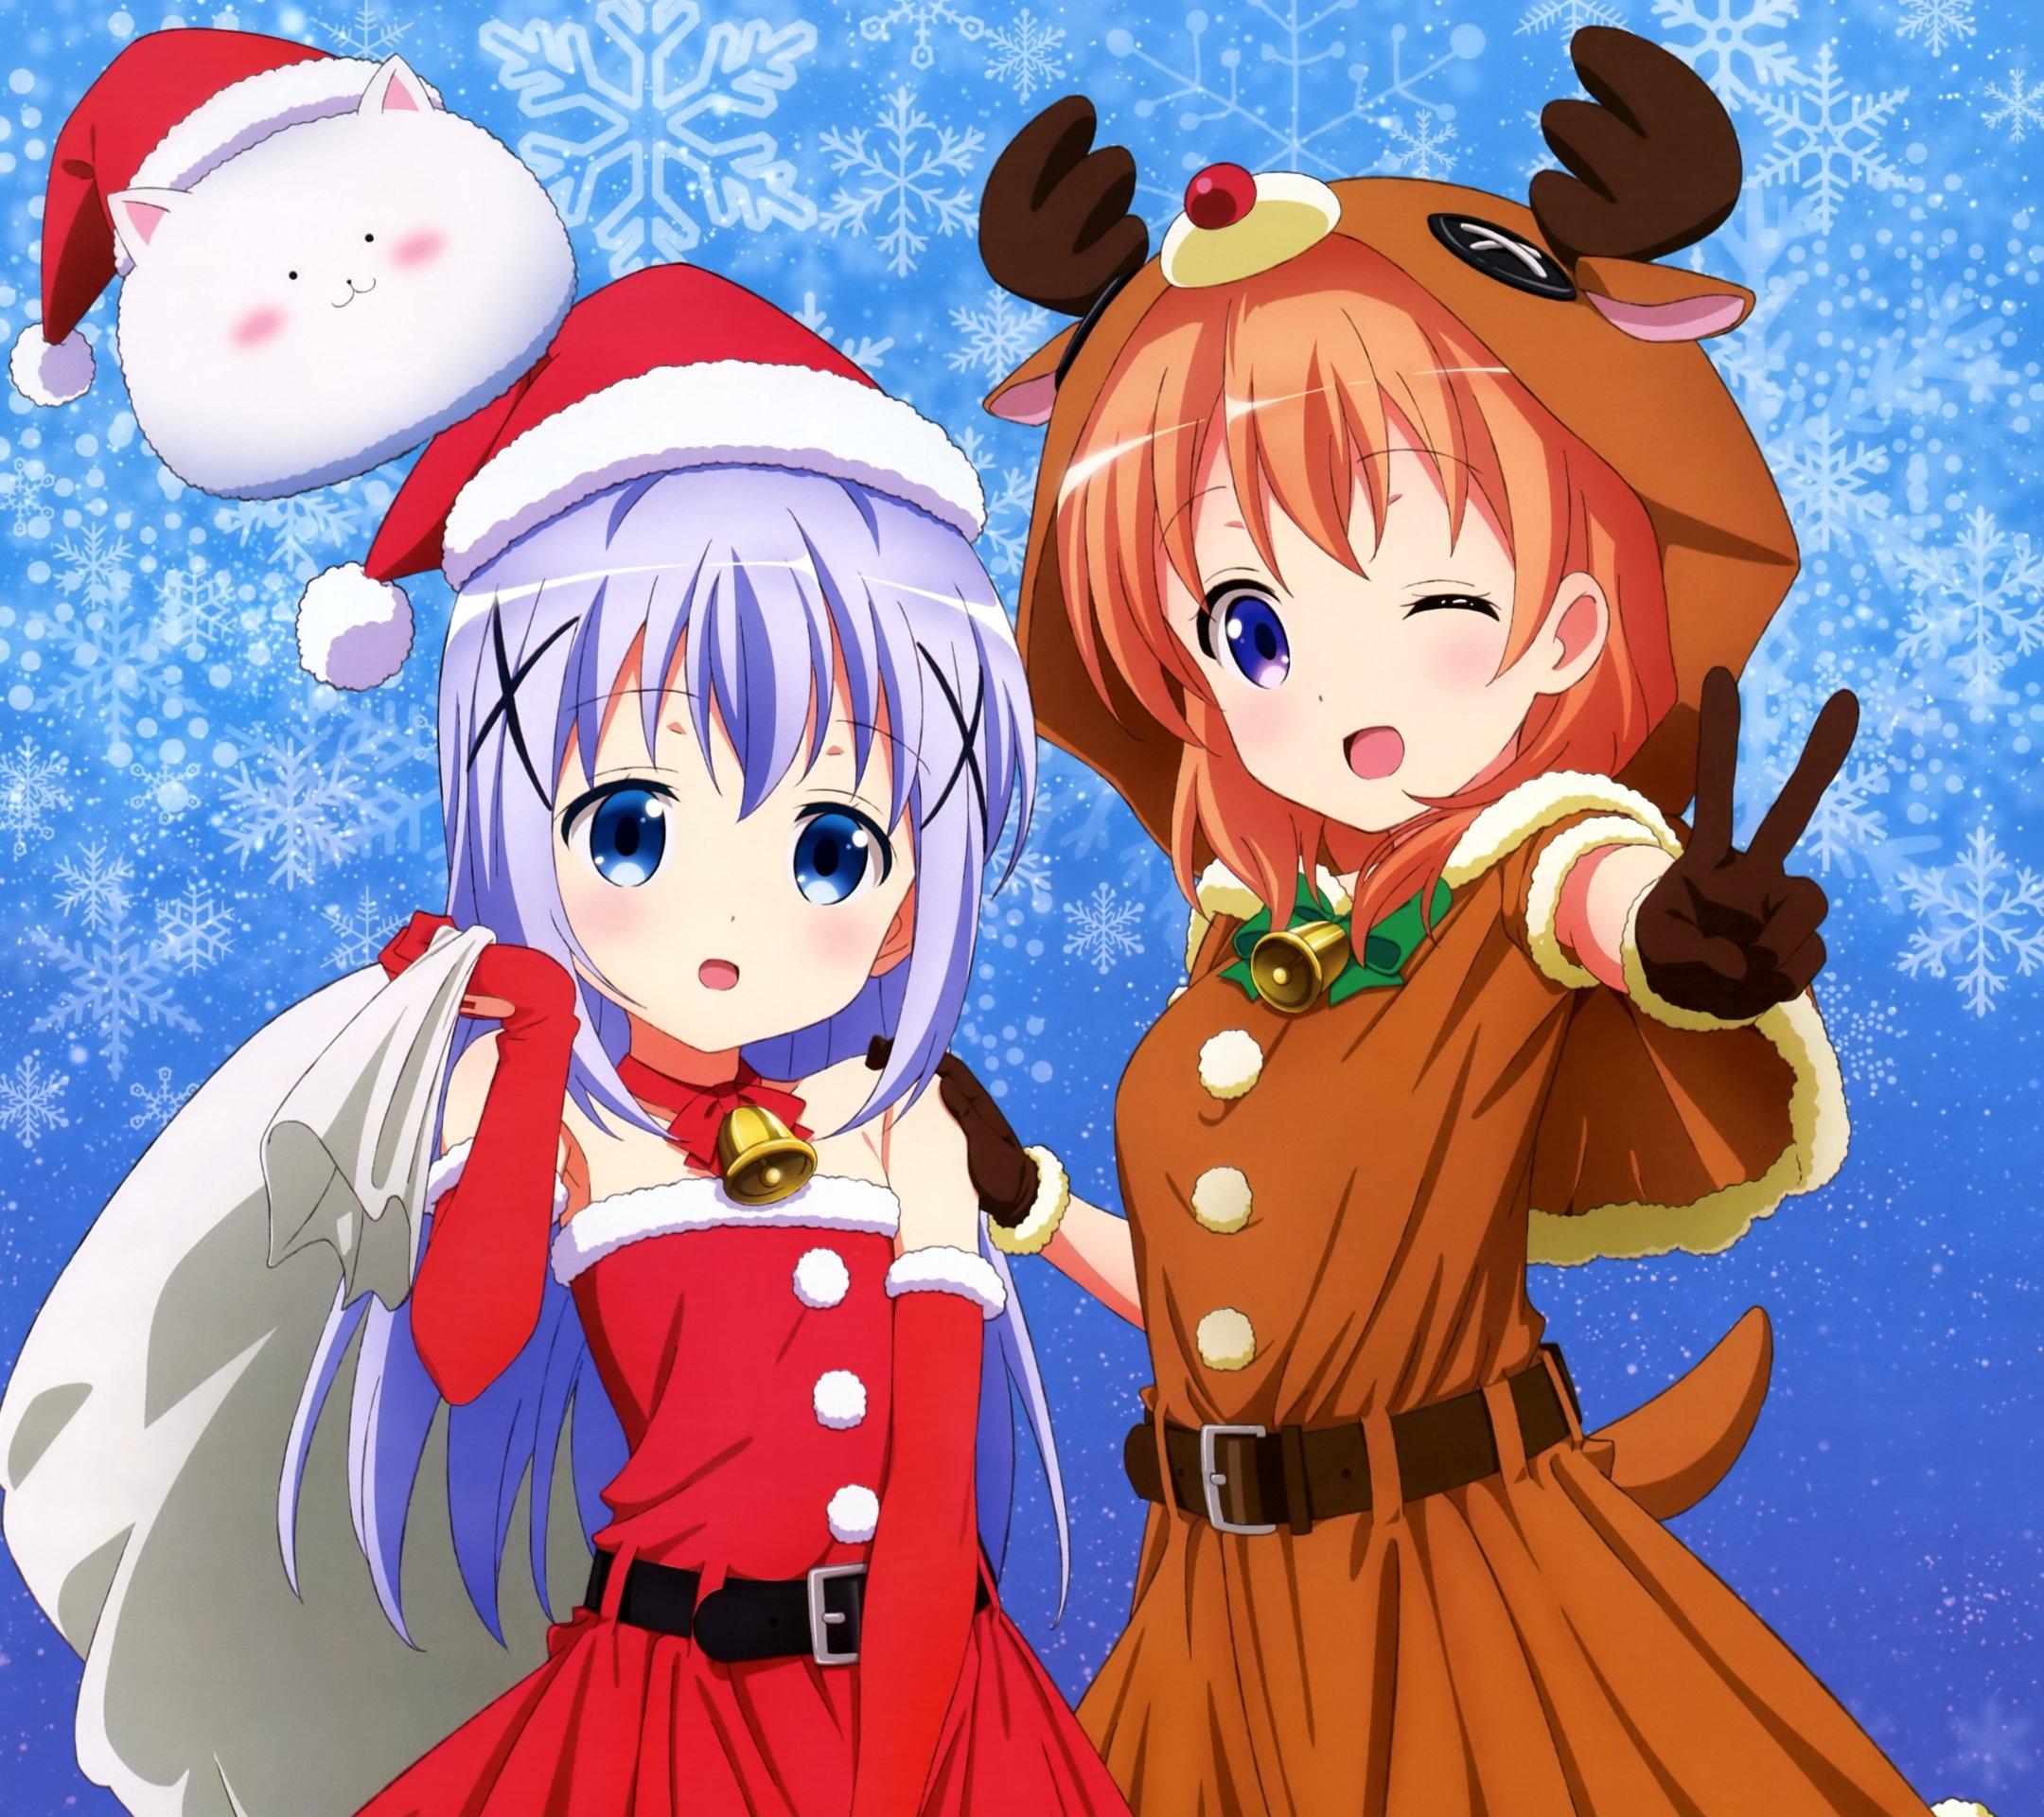 Christmas Anime  Gochumon Wa Usagi Desu Ka Cocoa Hoto Chino Kafu Android Wallpaper X